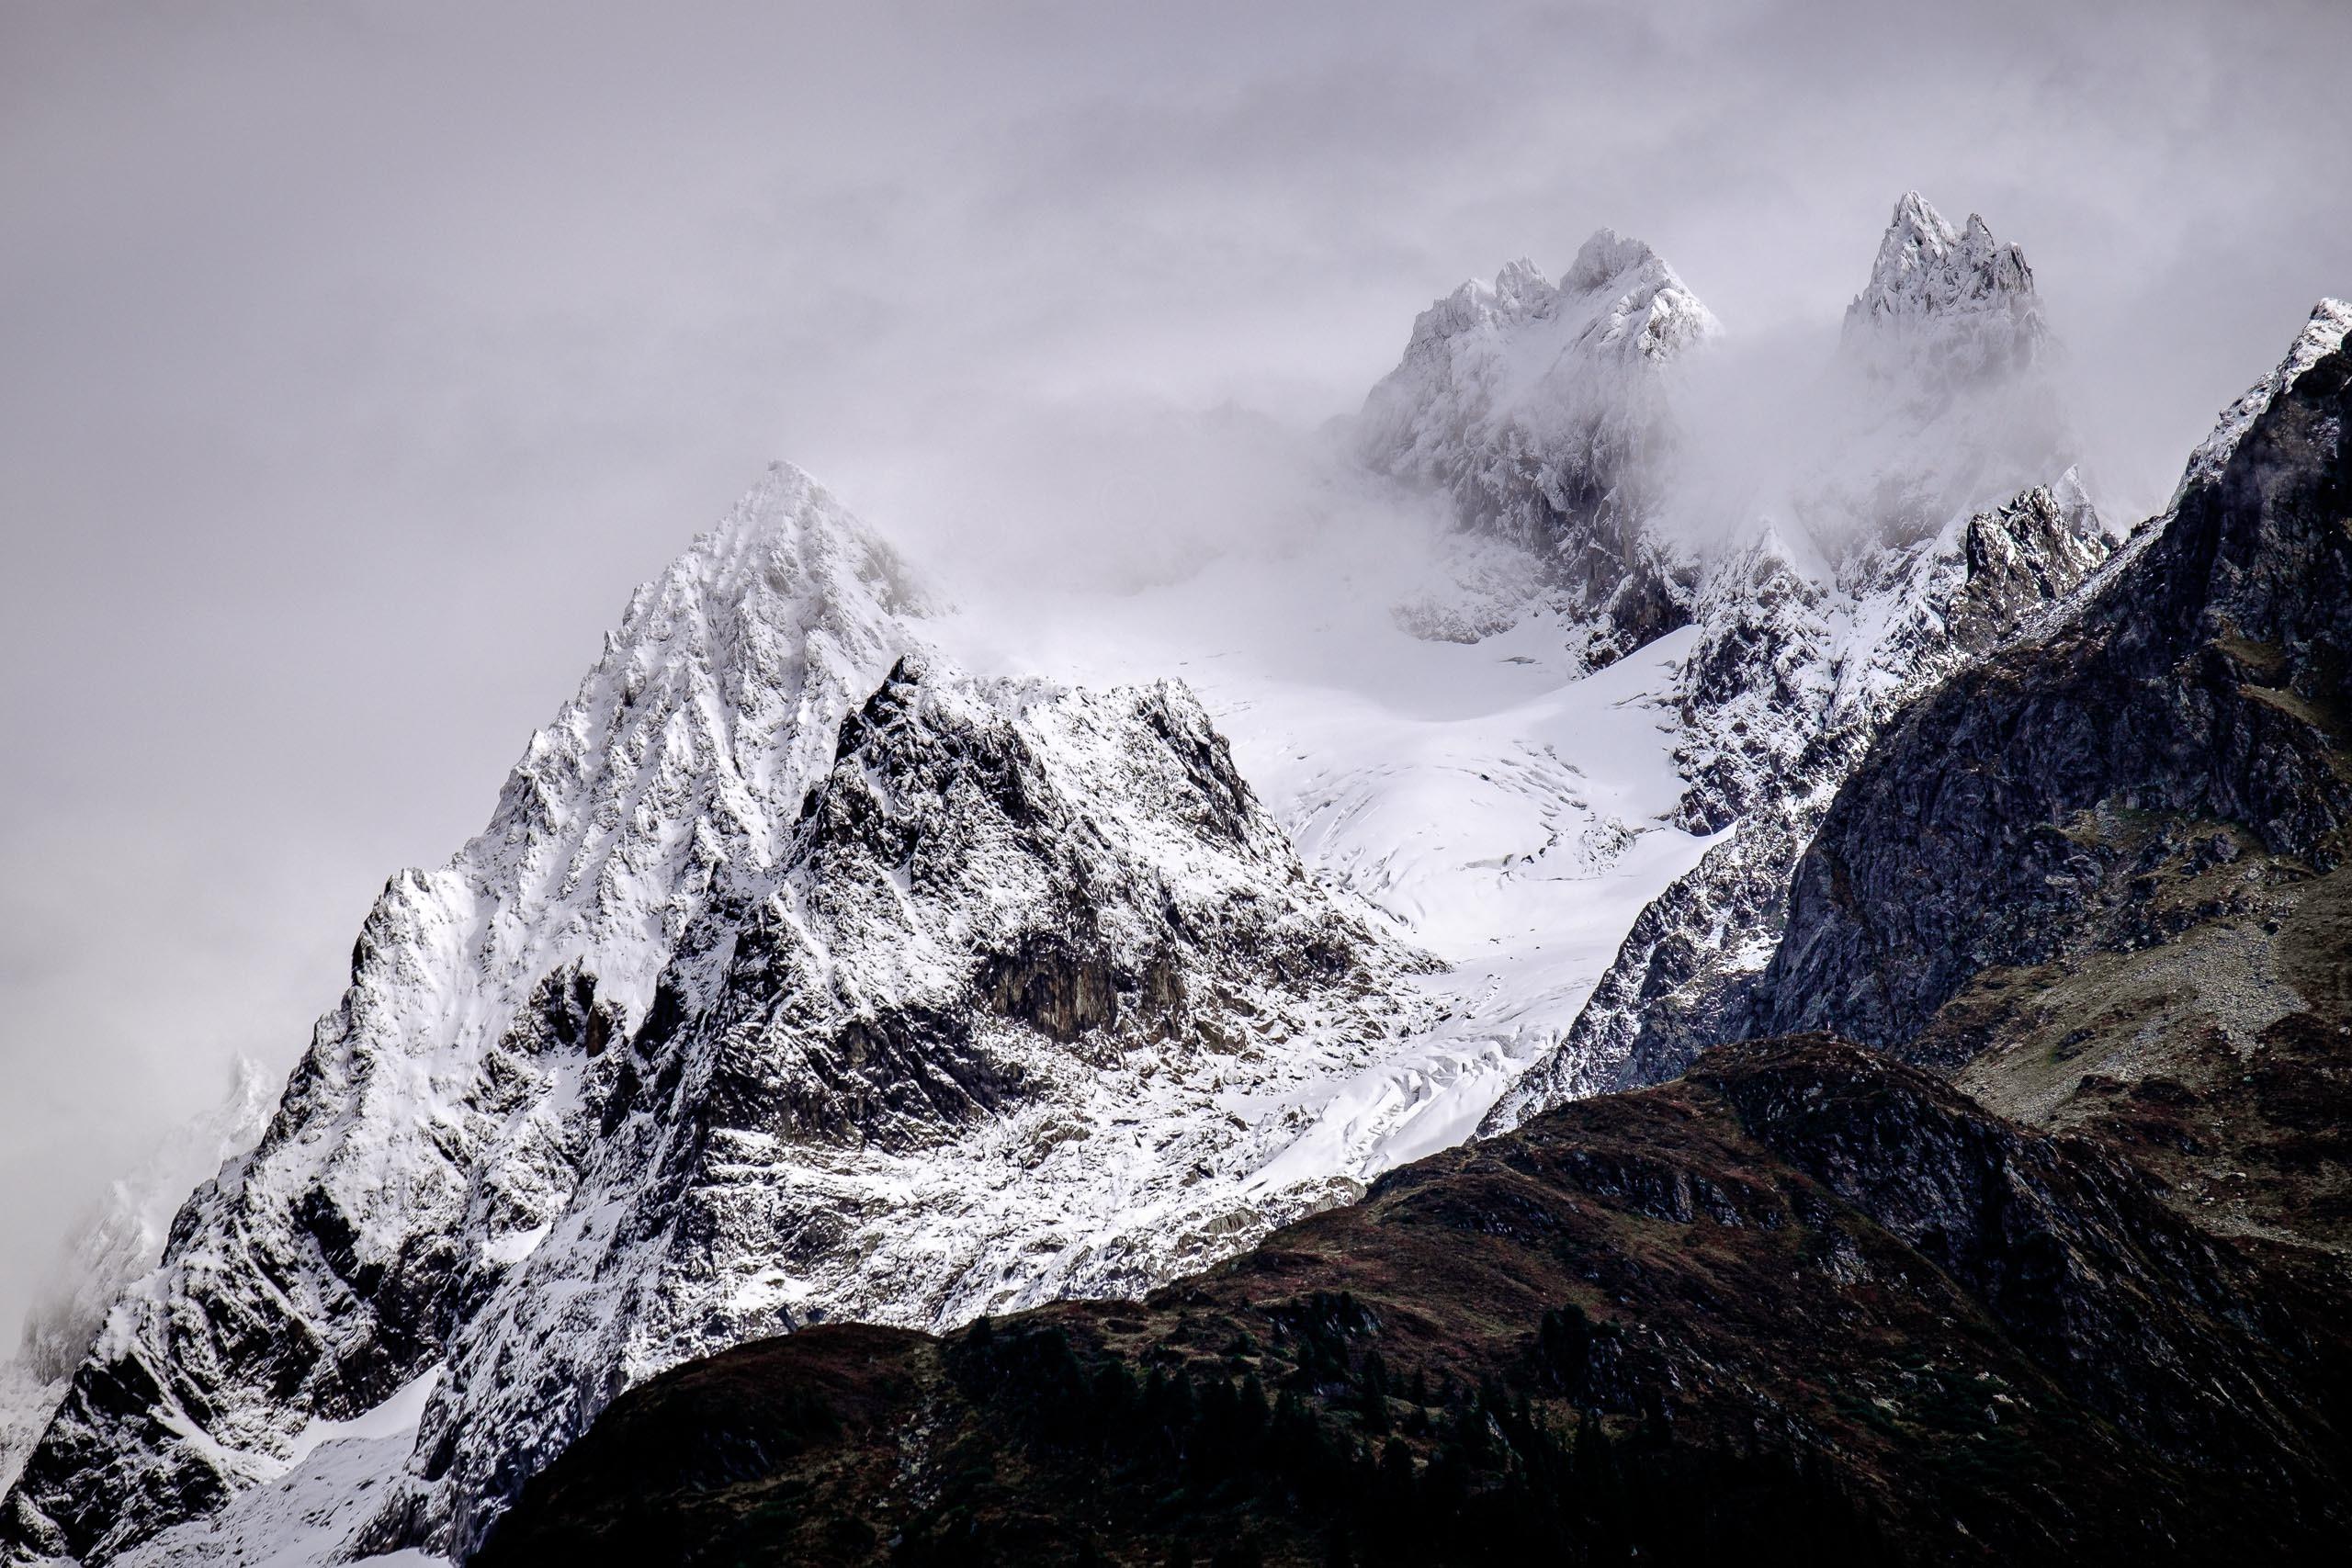 Urat glacier in Swiss canton Bern